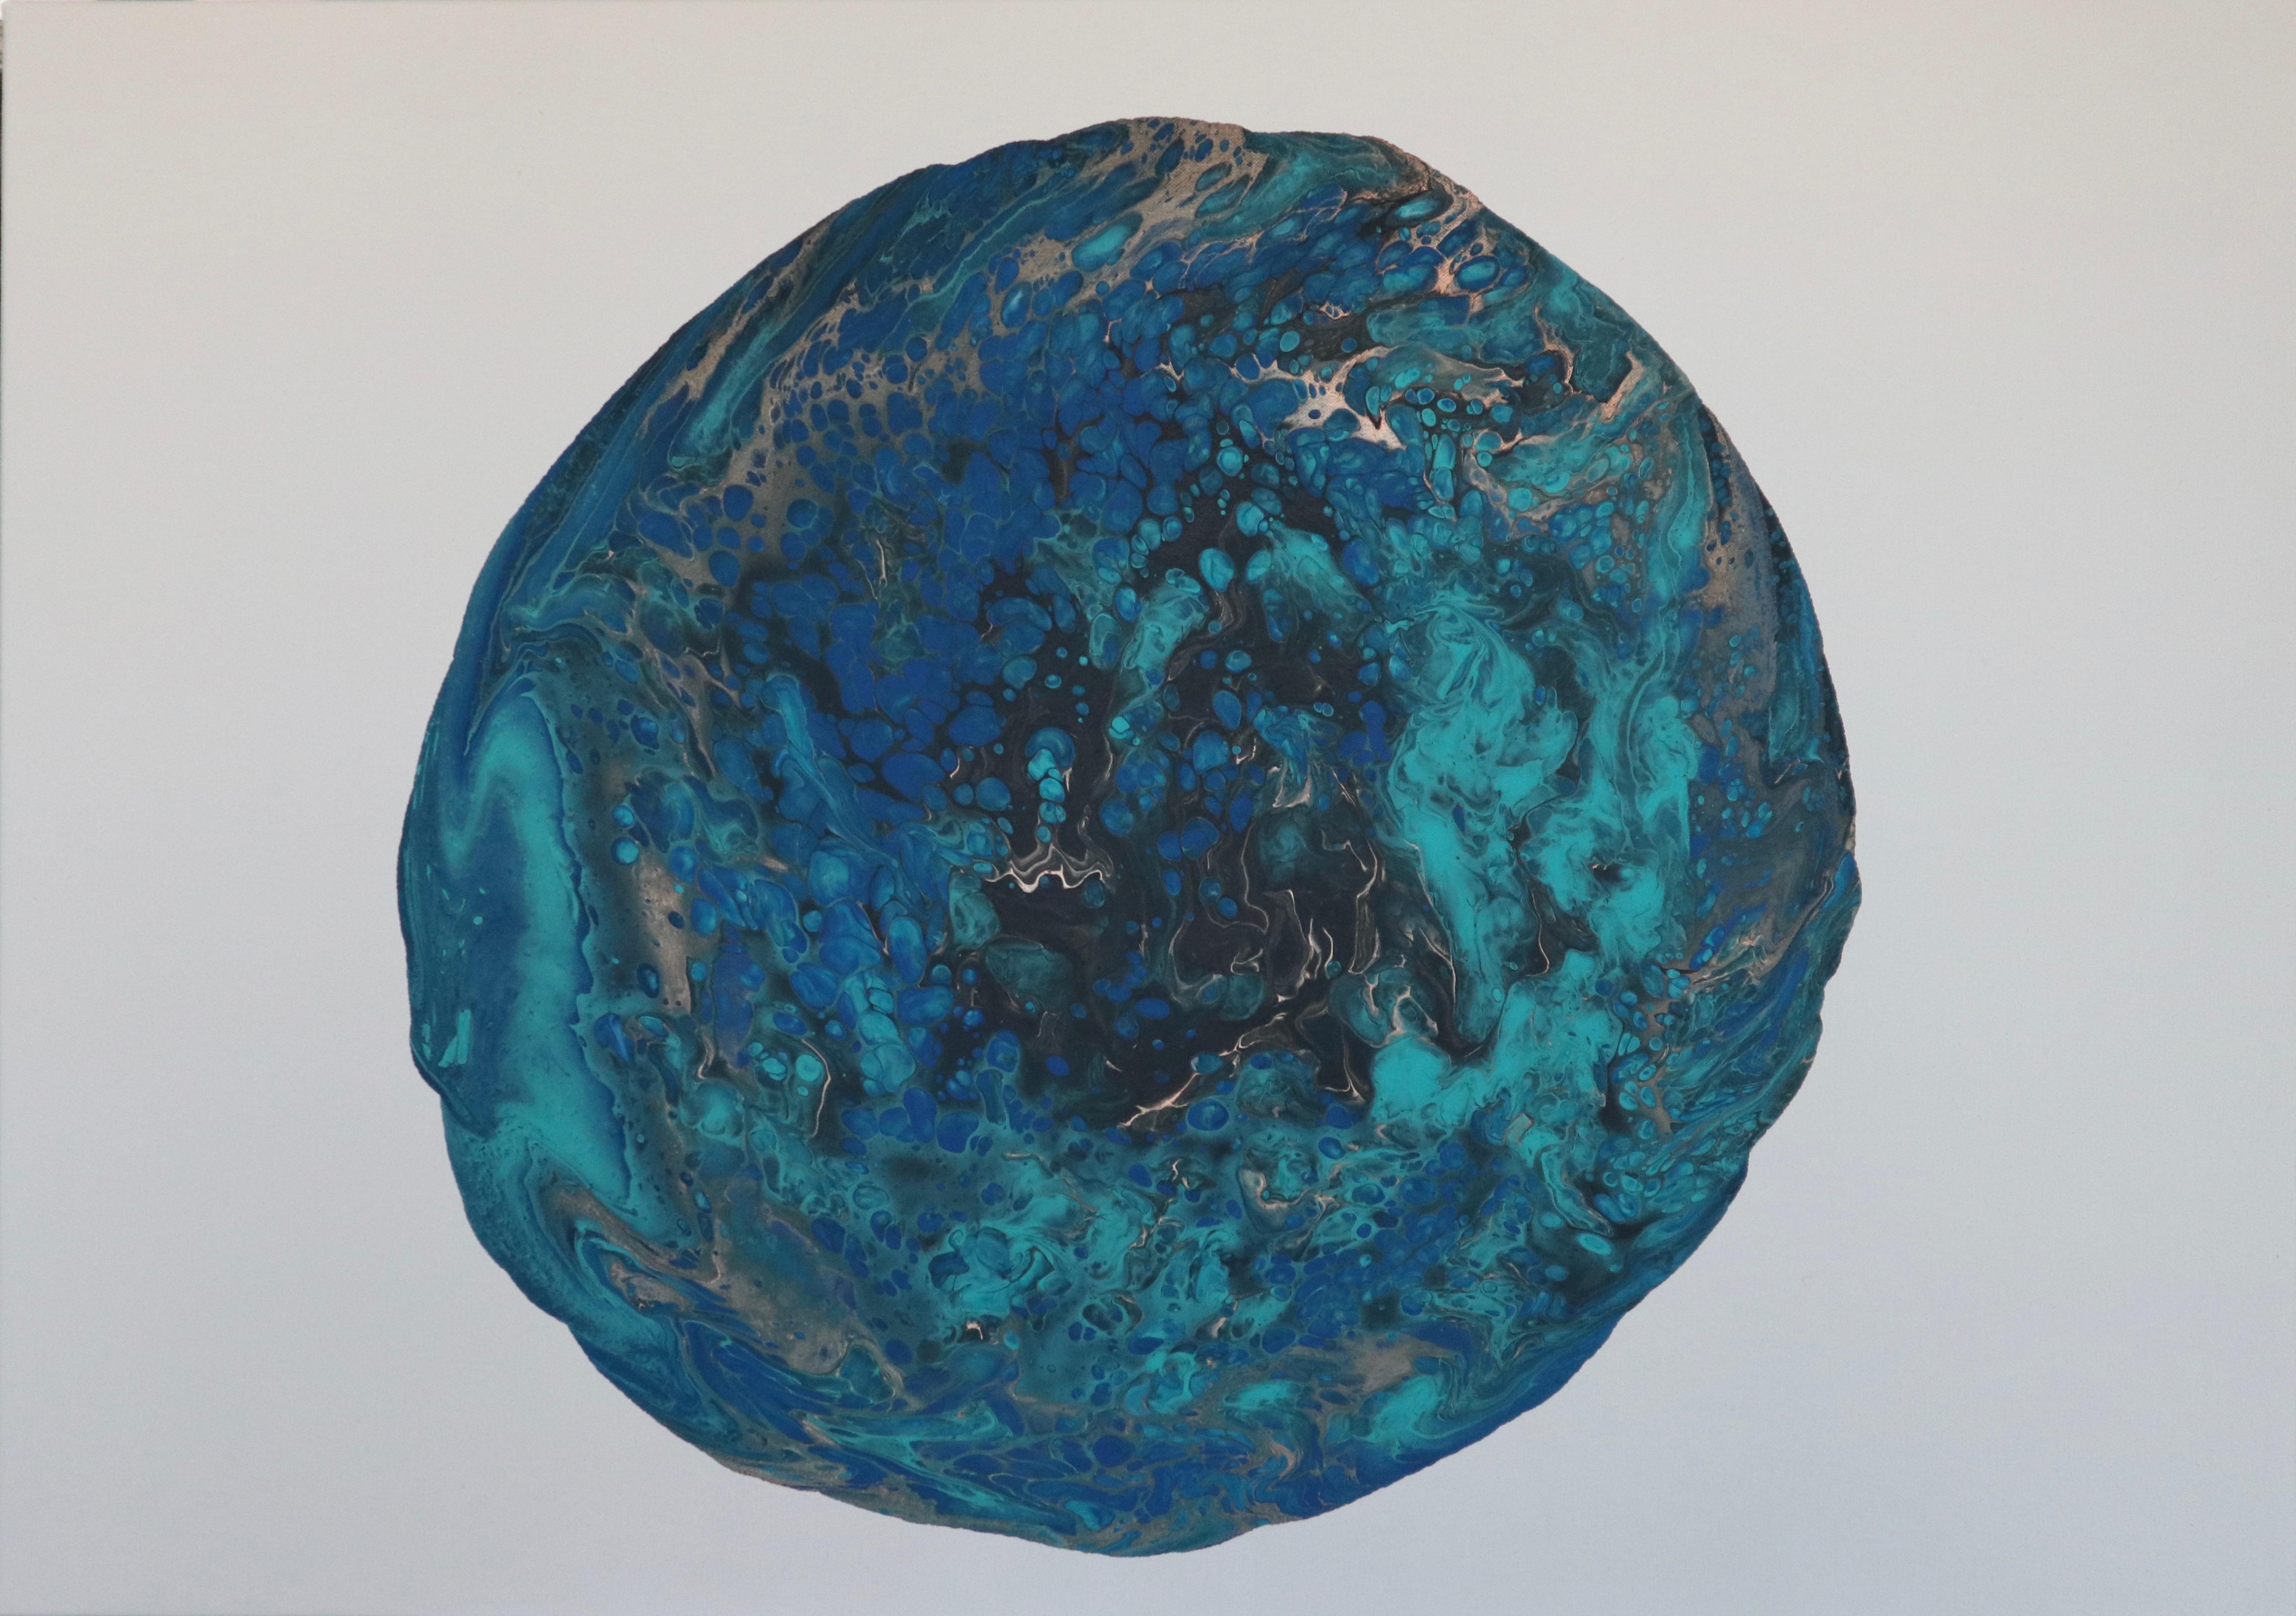 Planete bleu - Sophius